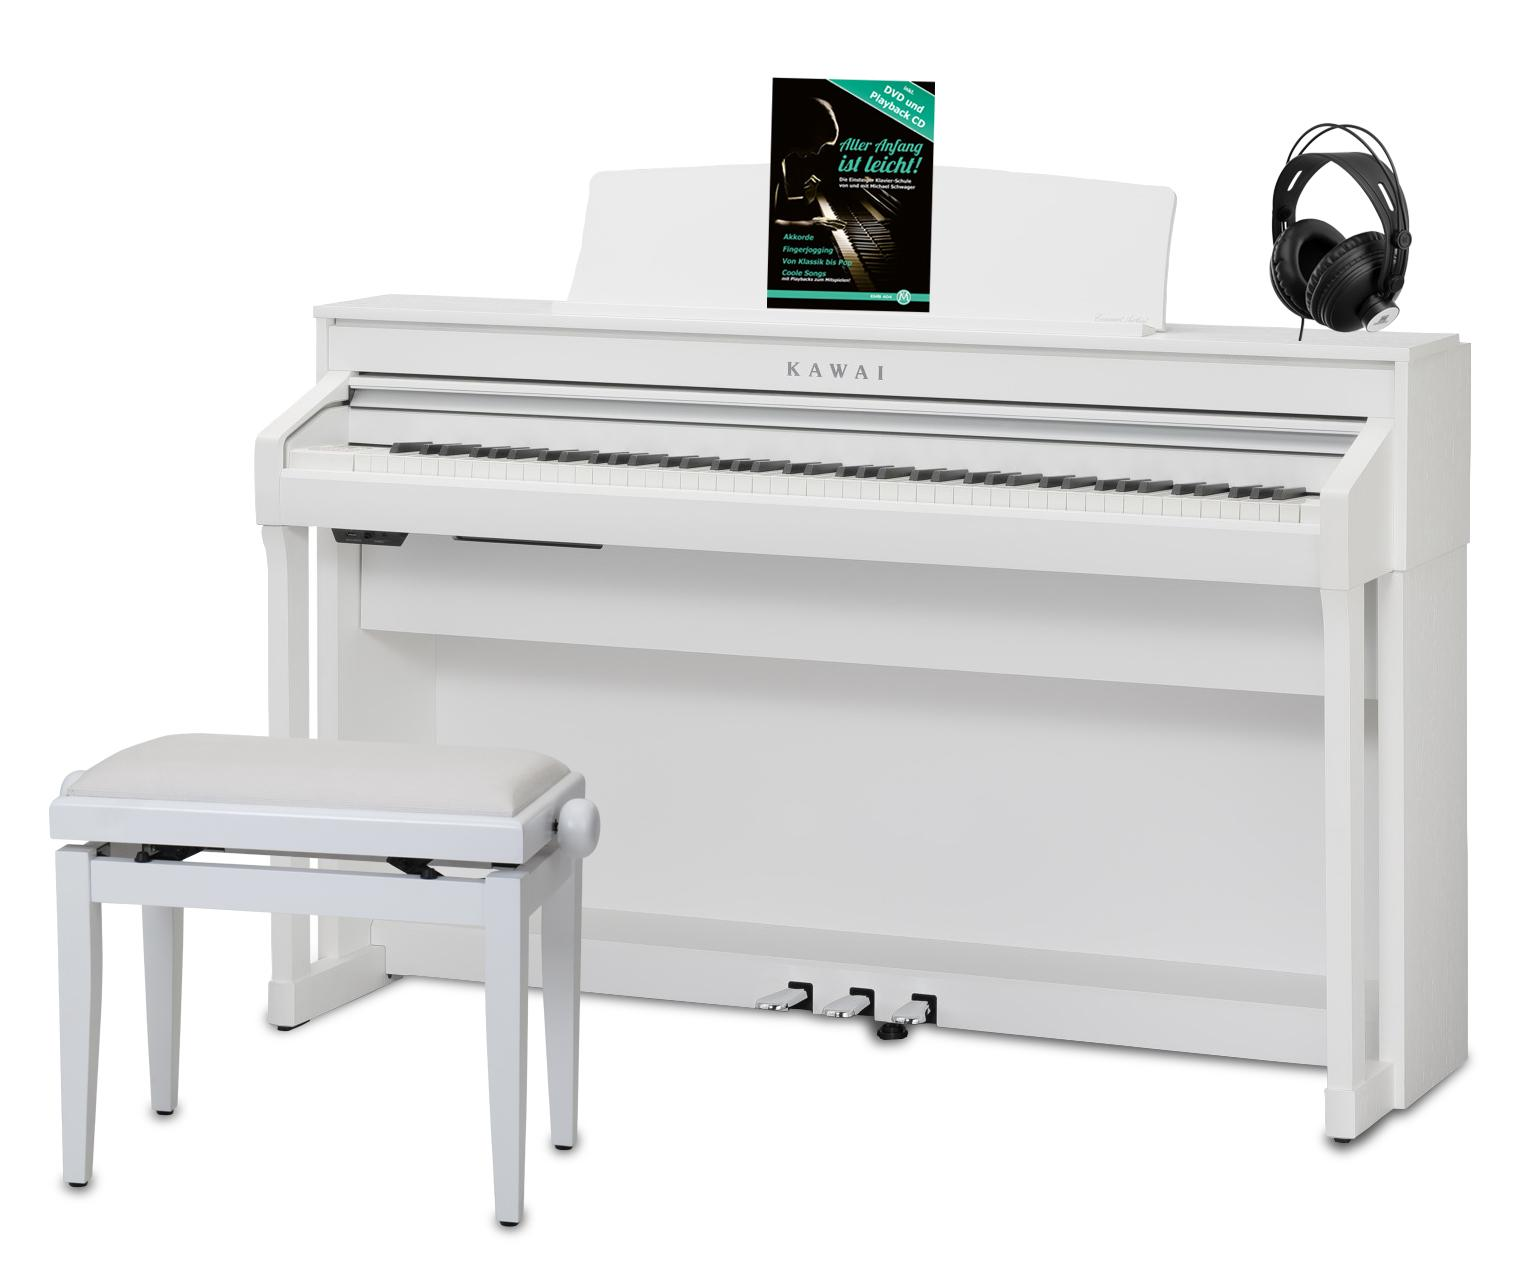 Kawai CA 58 W Digitalpiano Set, Weiß satiniert